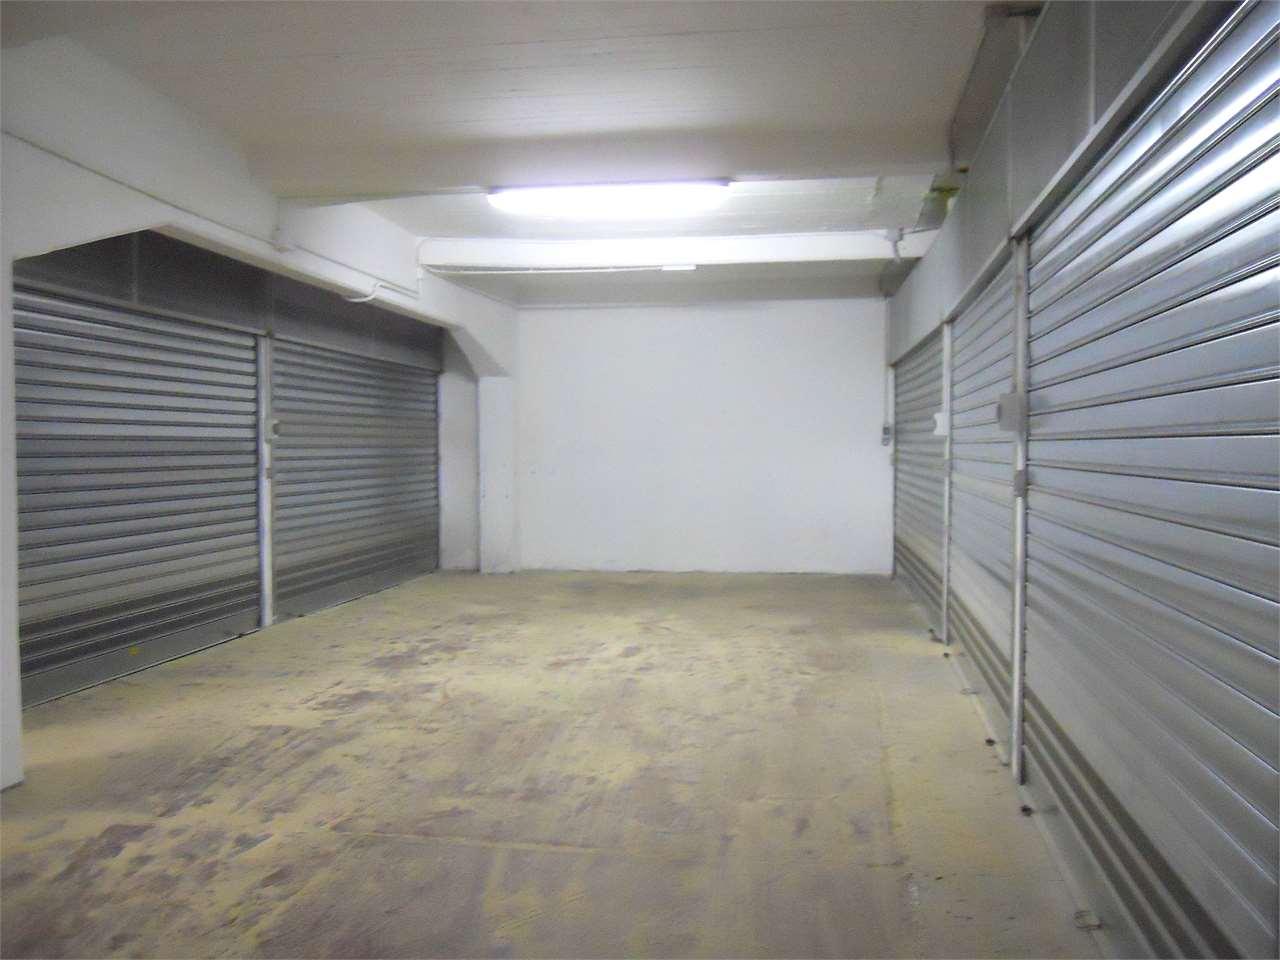 Vendita Garage Garage/Posto Auto Asti Viale Pilone 78  46827